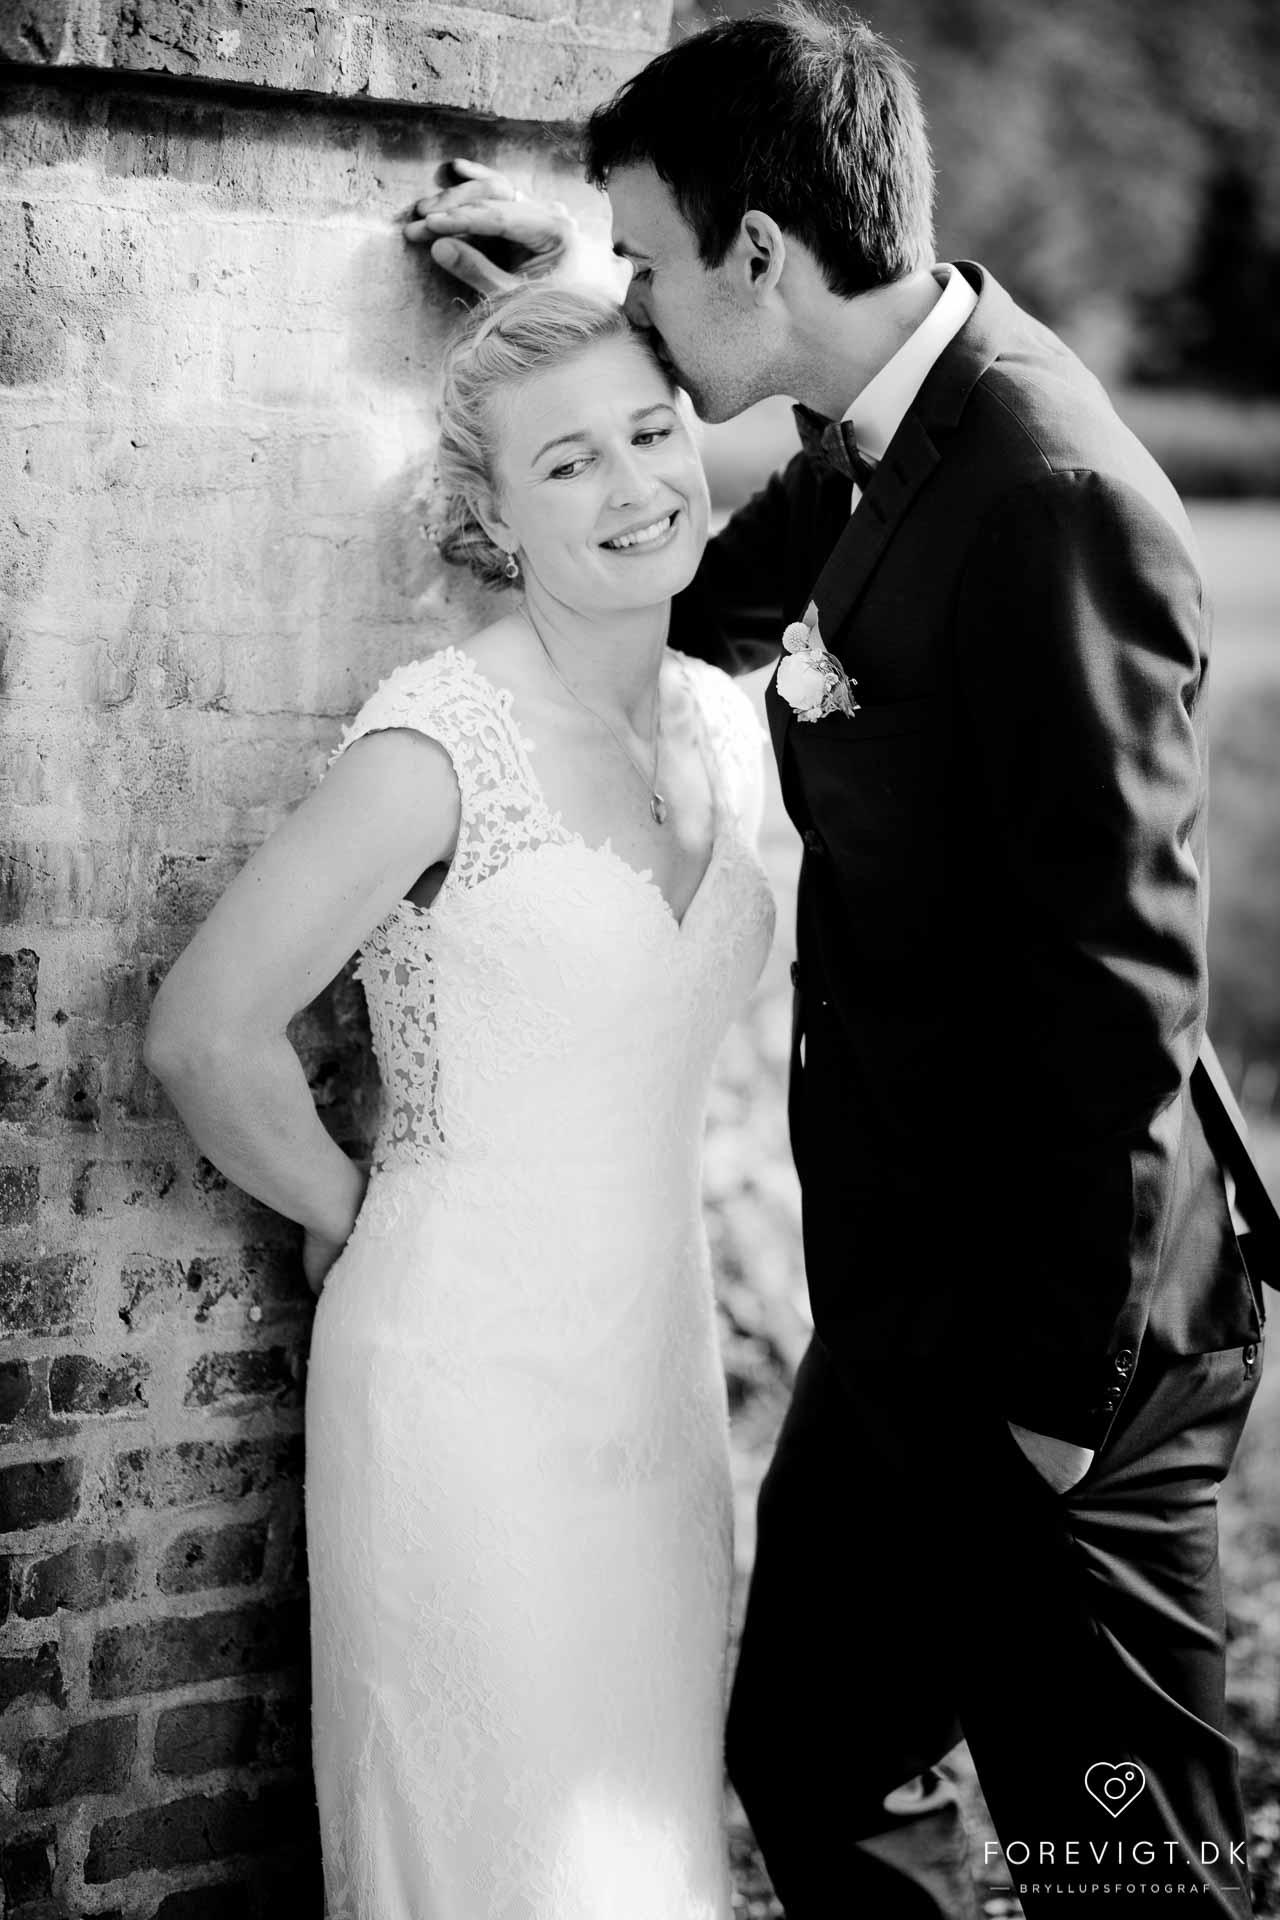 Skarrildhus bryllup. En smuk og hyggelig bryllupsdag først med vielse